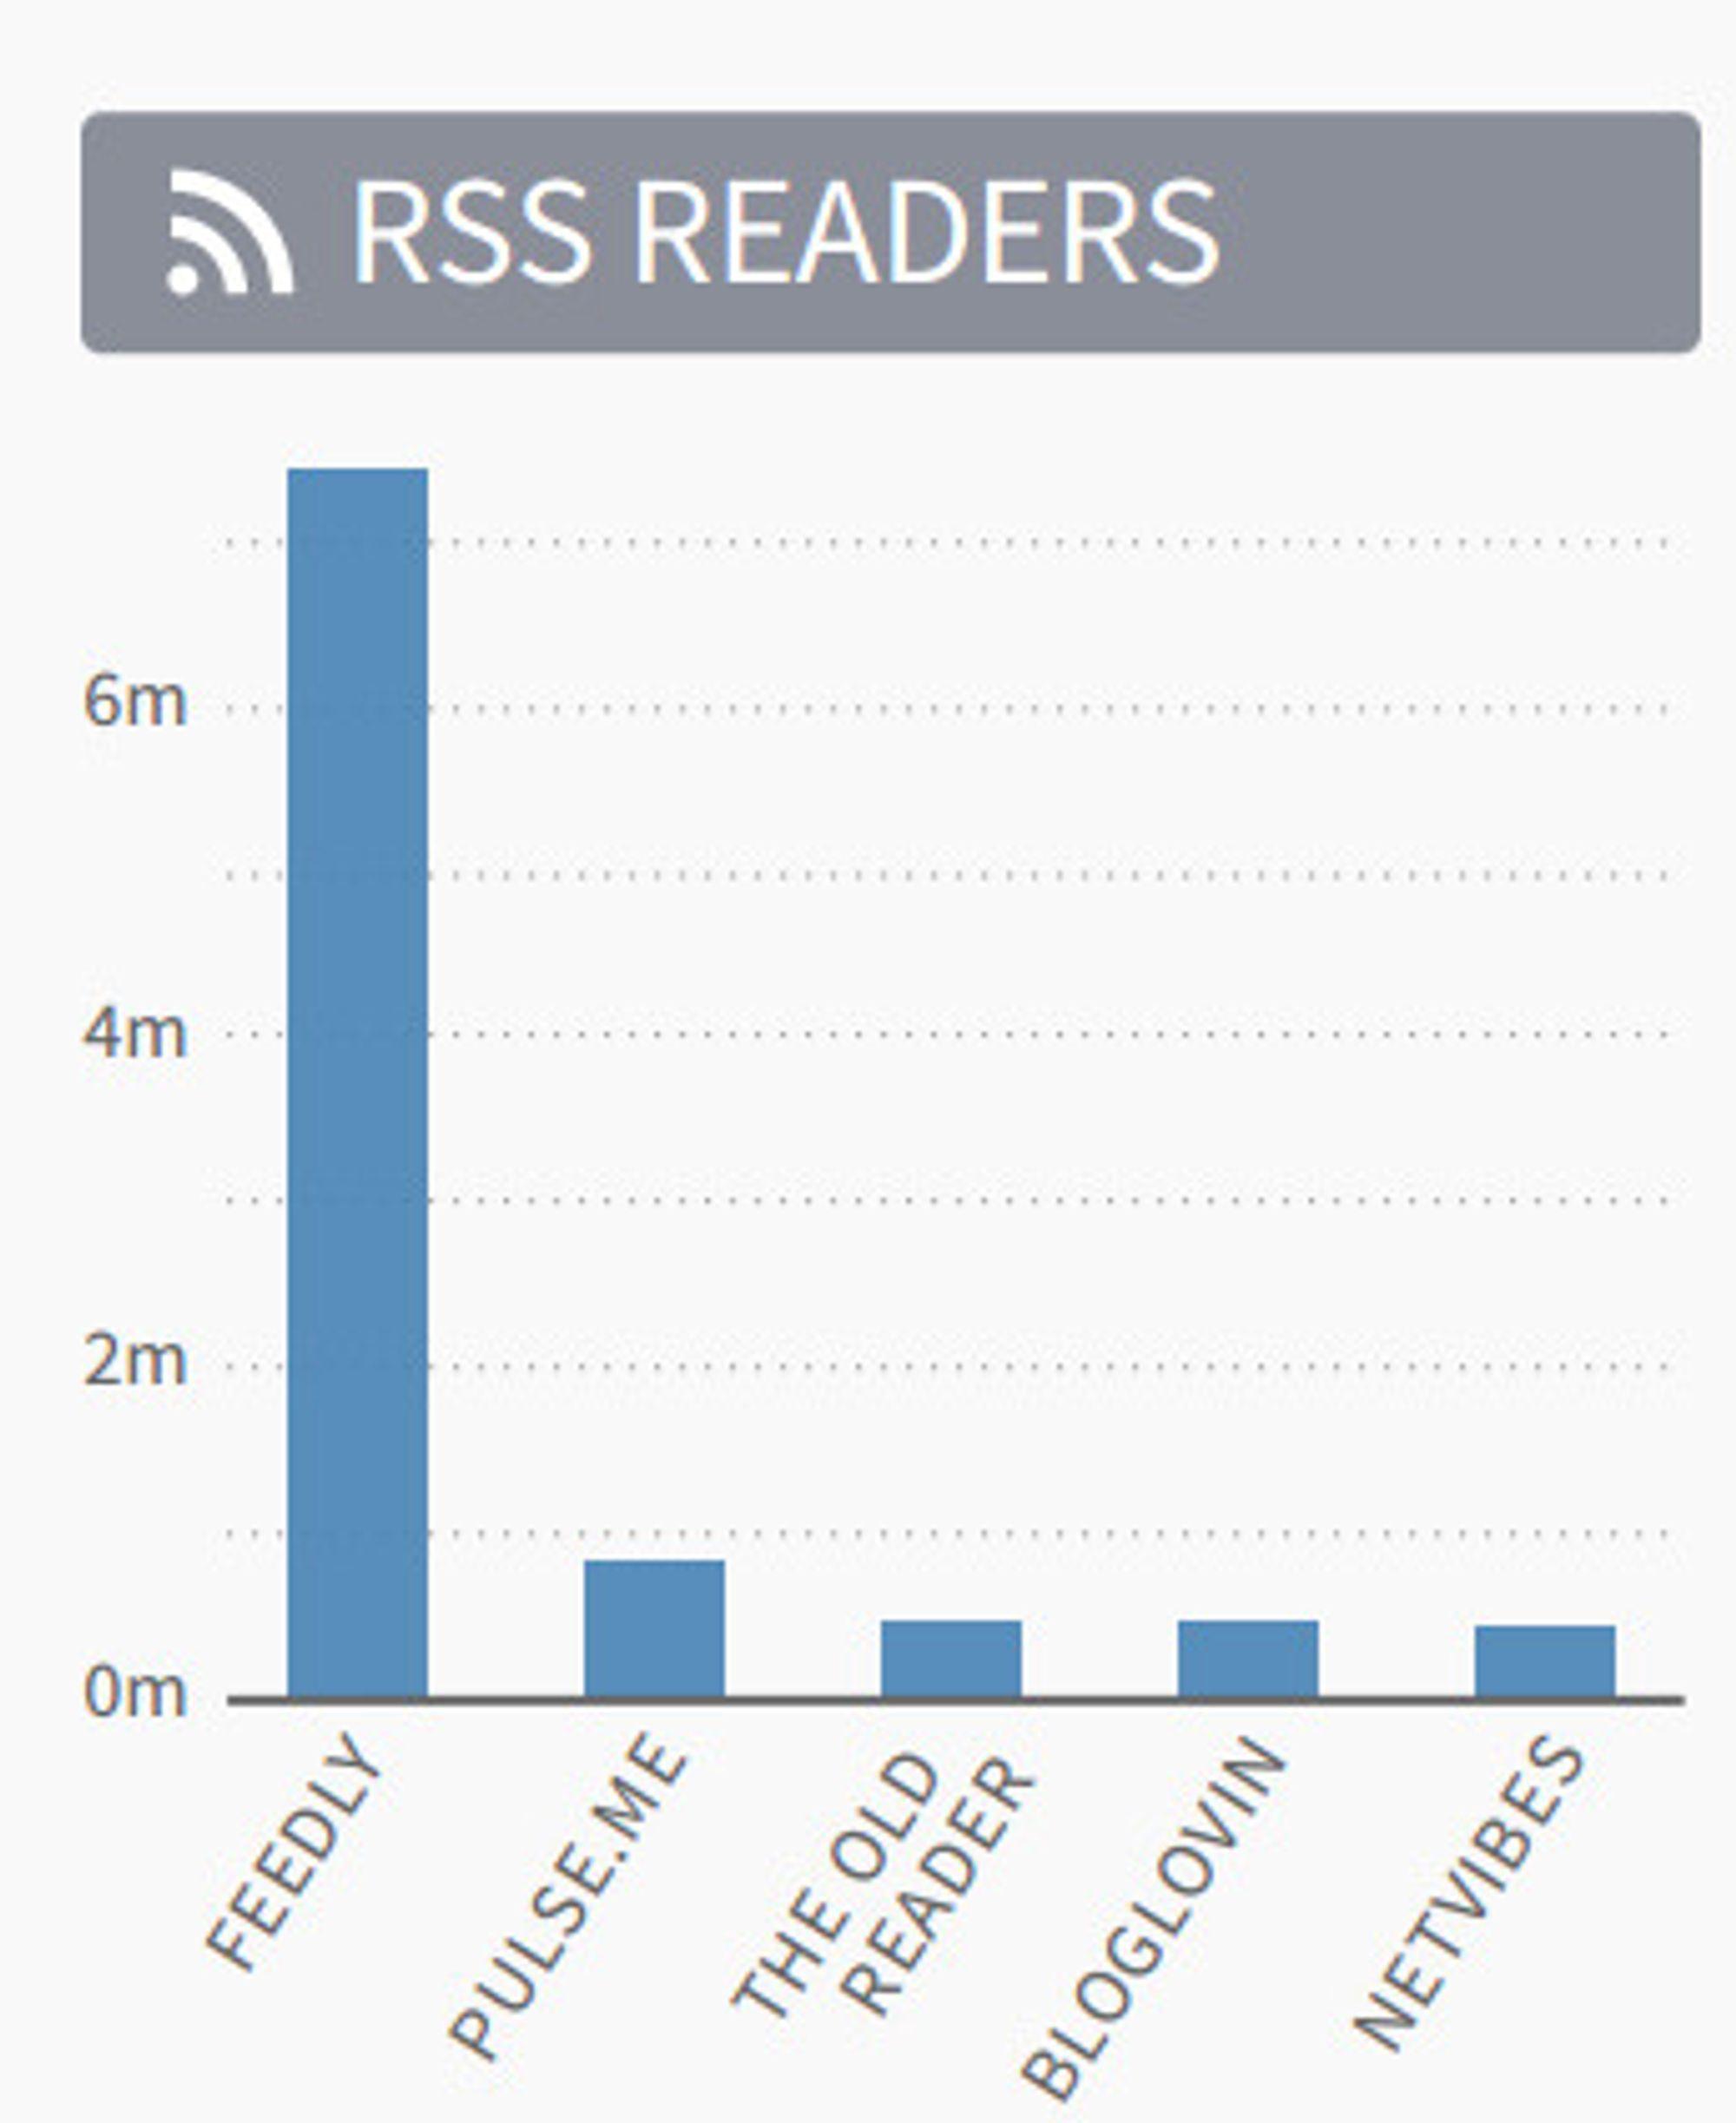 De mest trafikkskapende RSS-leserne i juli 2013.